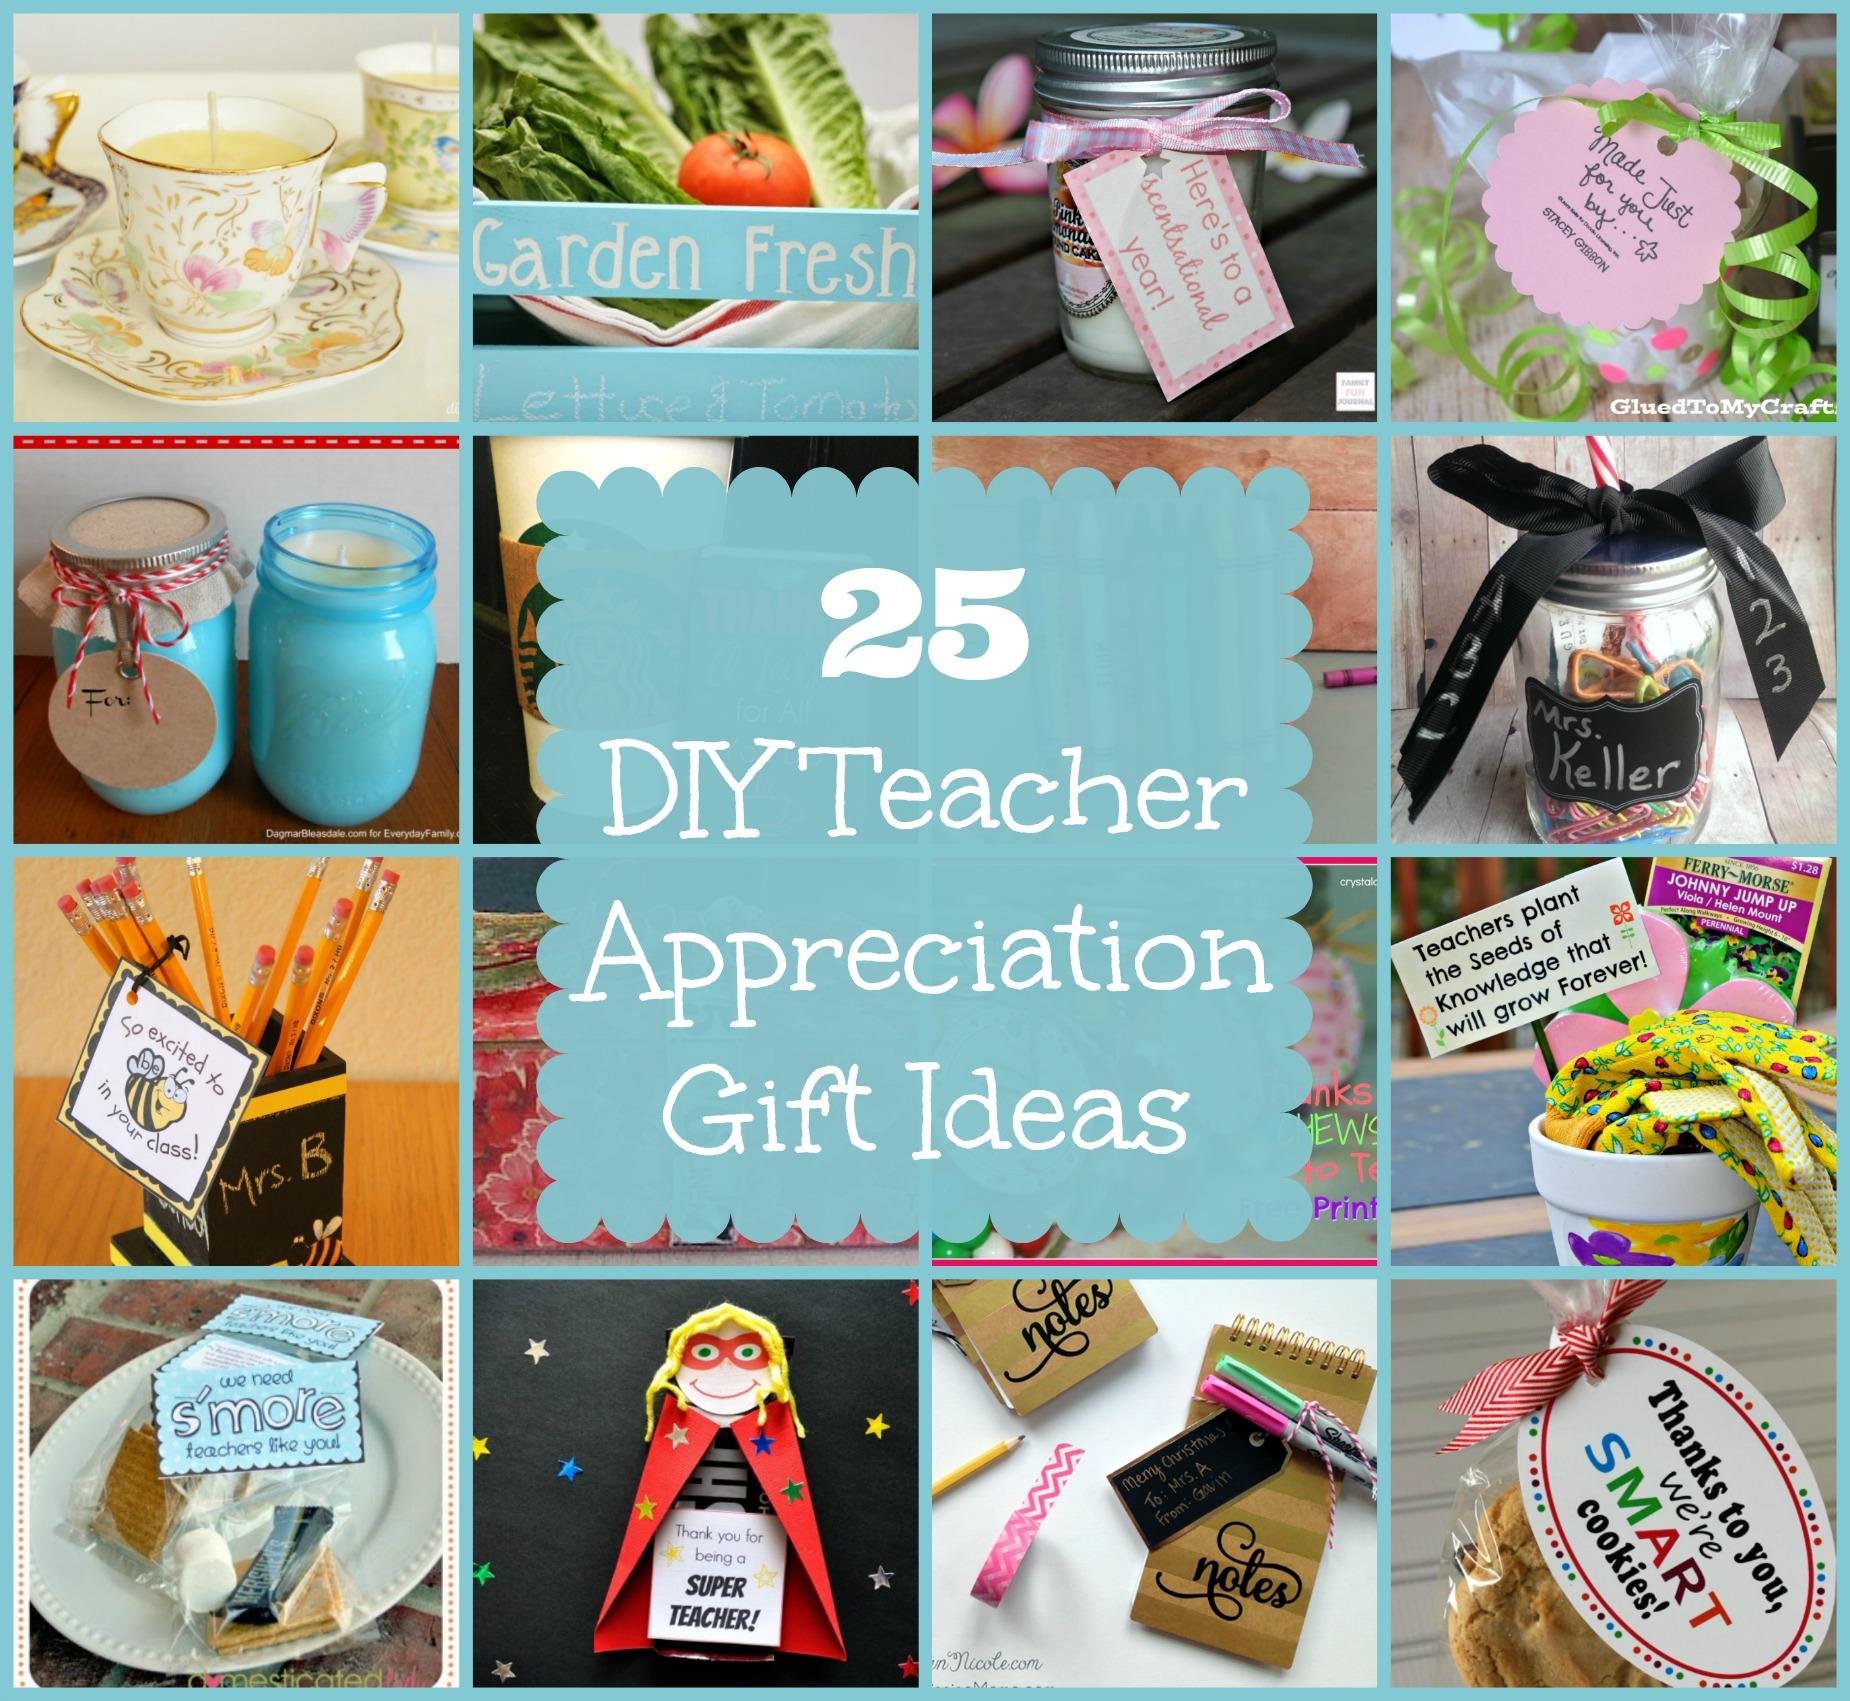 Diy Gift Idea Day Teacher Home Art Decor: 25 Teacher Appreciation Gift Ideas